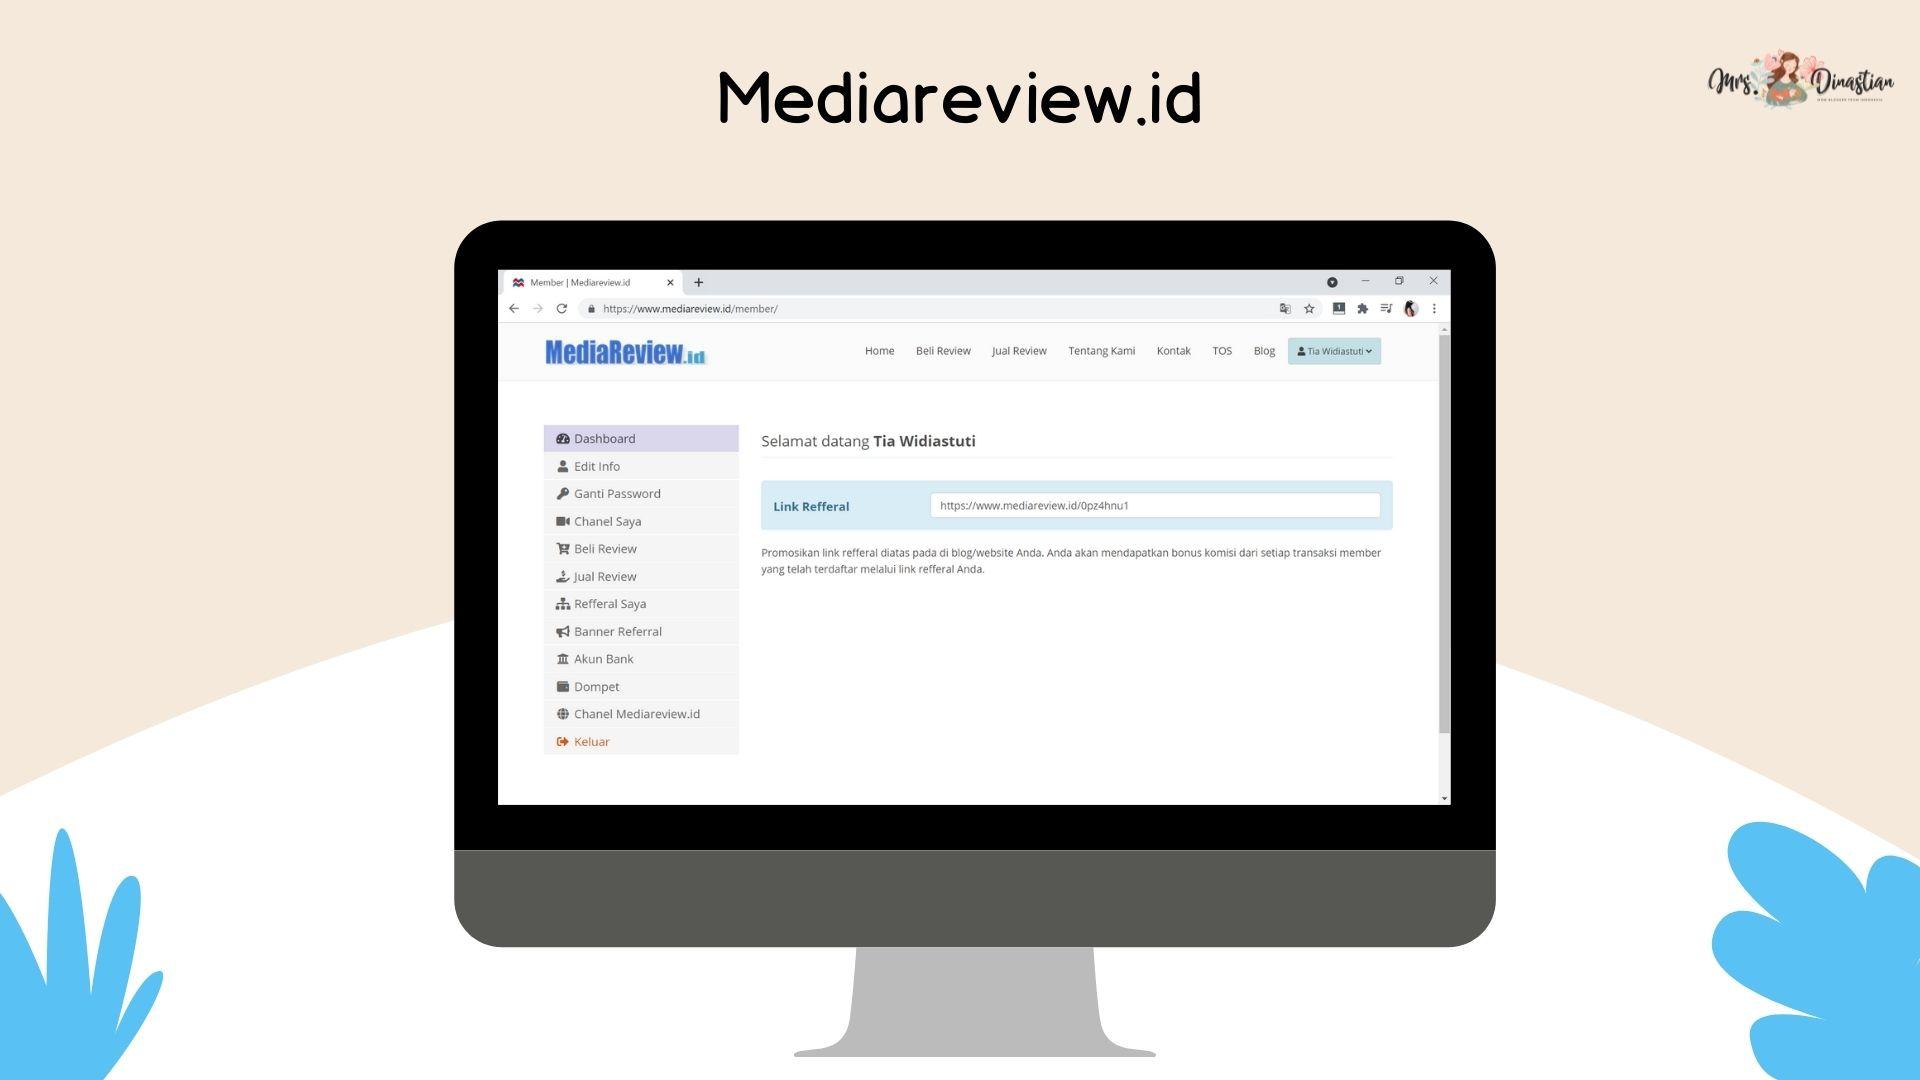 Mediareview